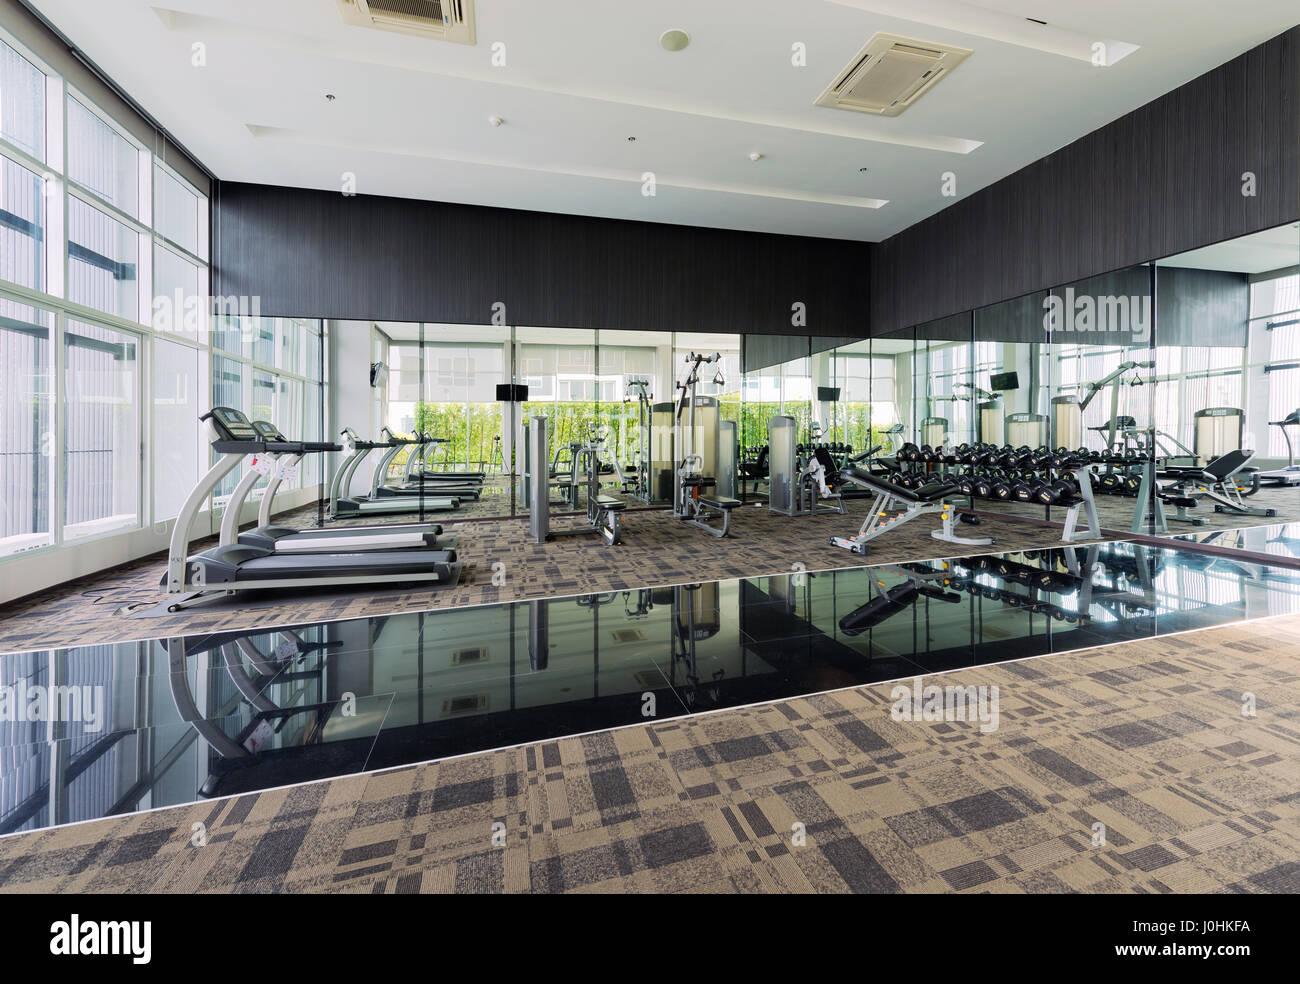 Fitness Center Interior Design Gym Stock Photo Royalty Free Image 138071454 Alamy